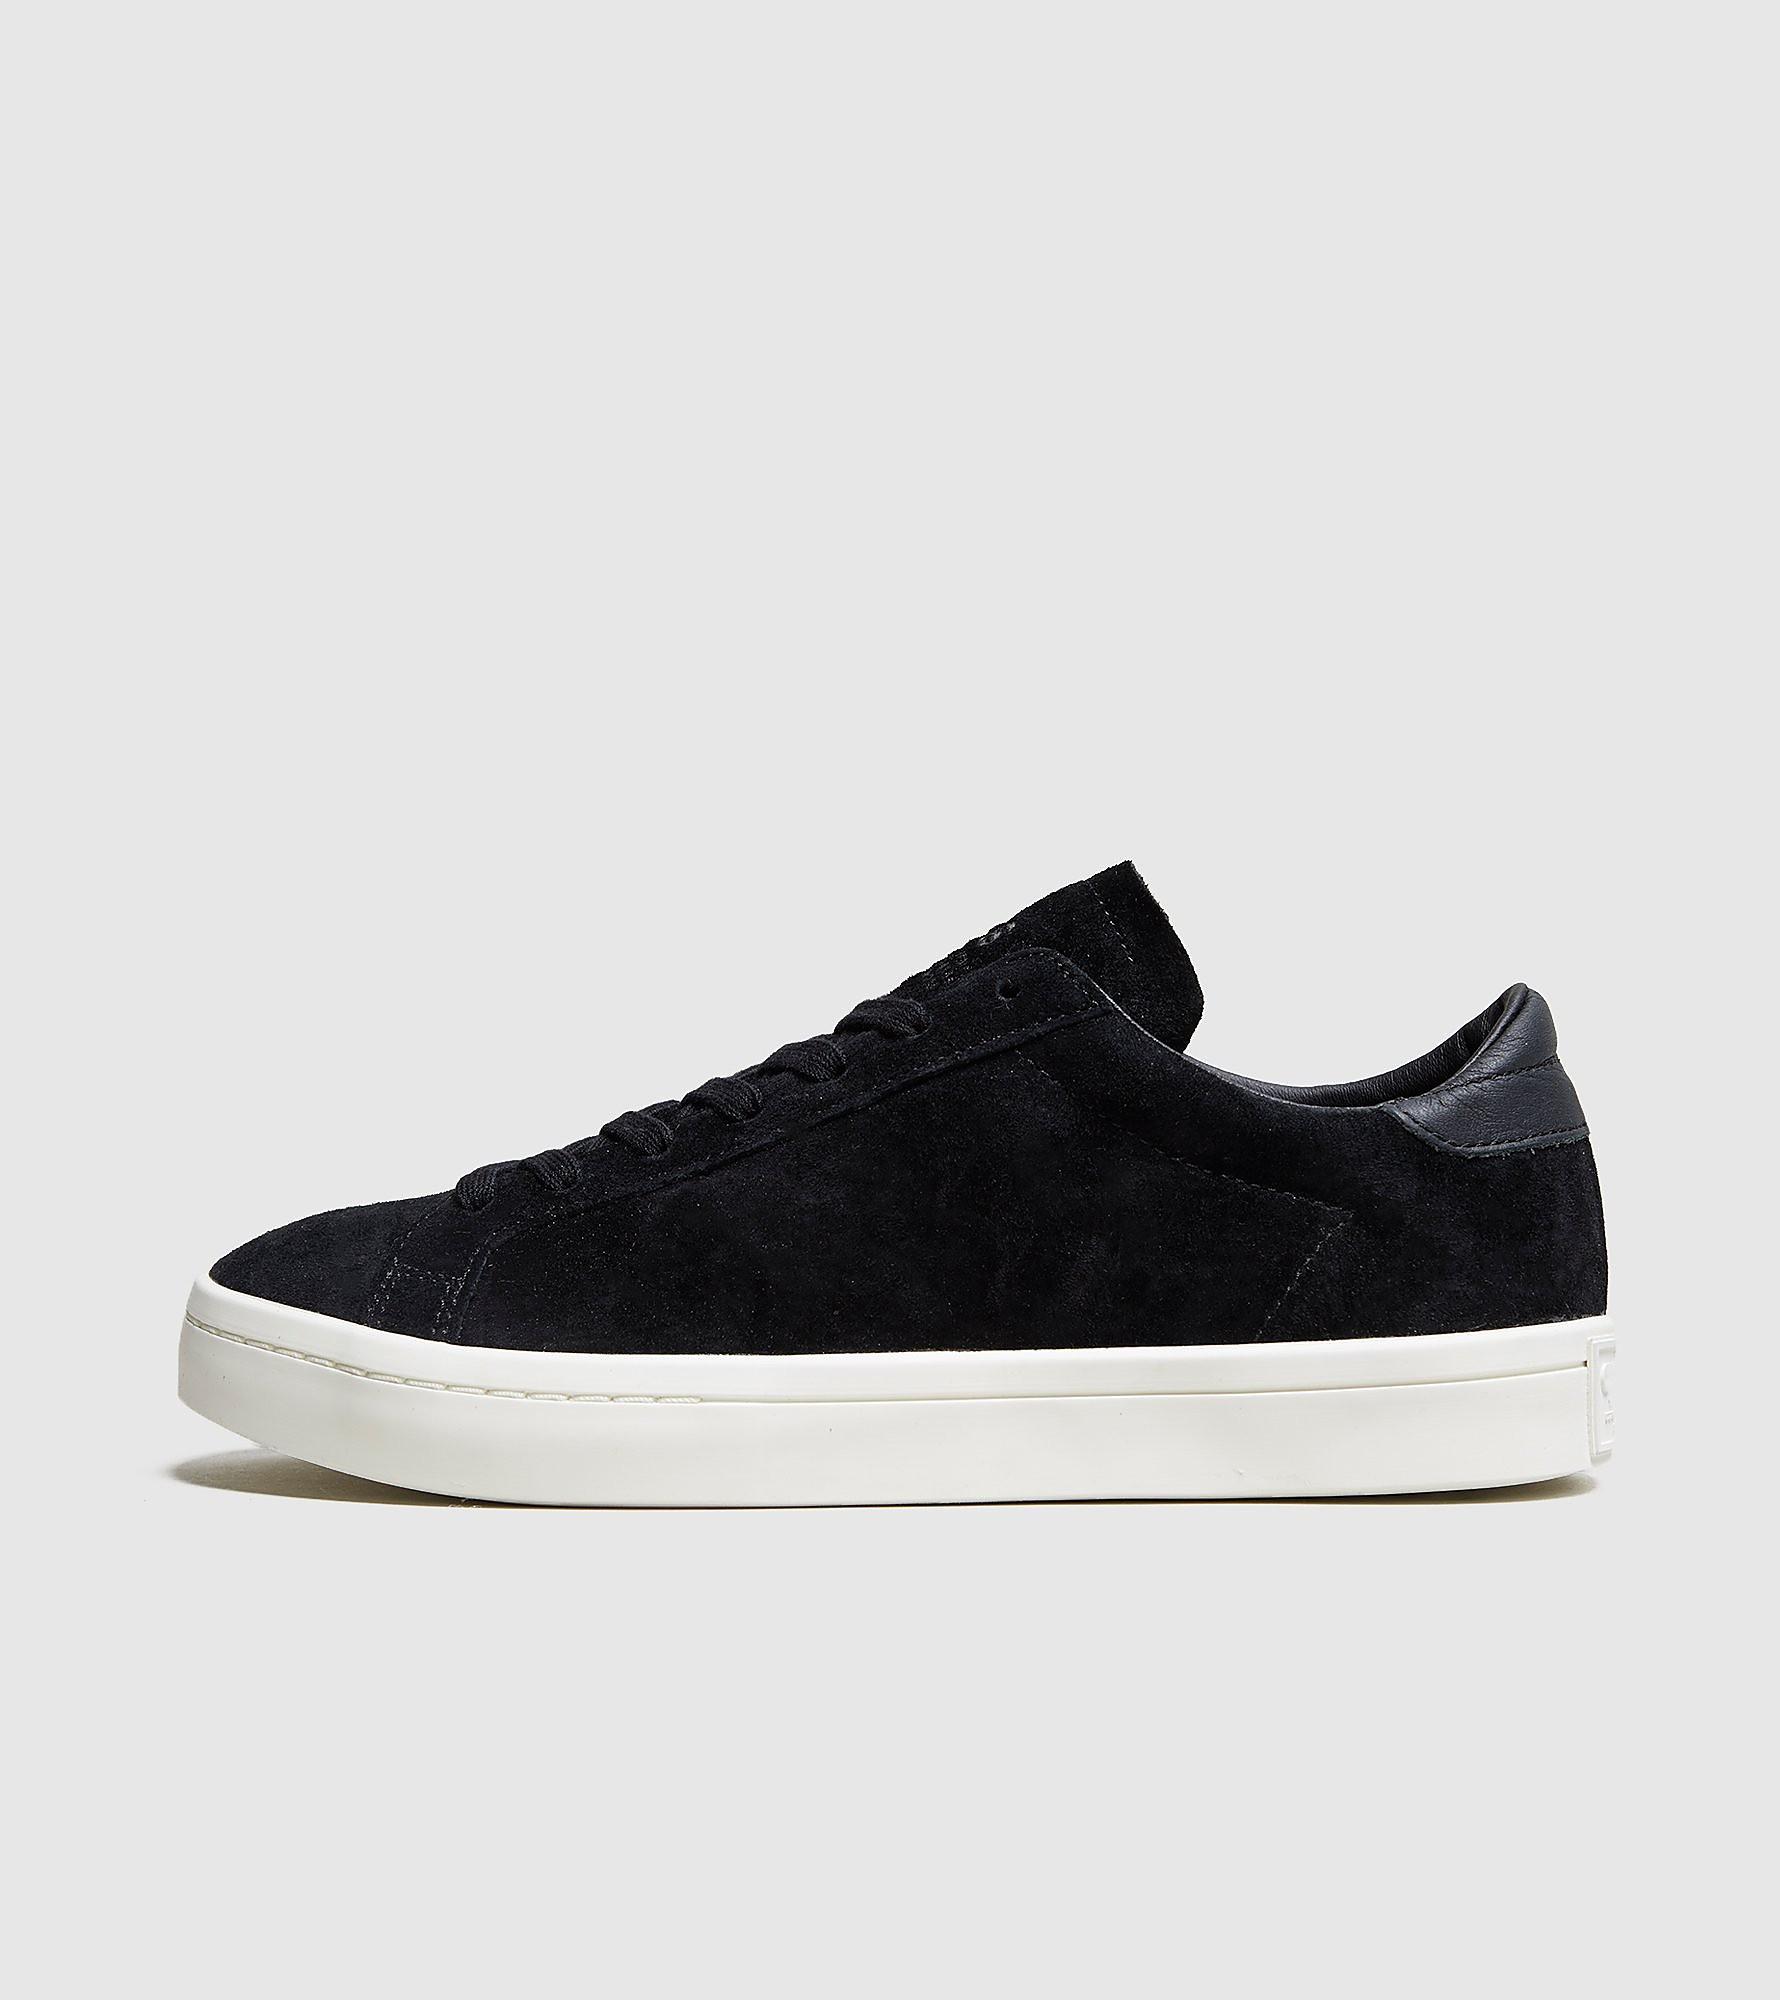 adidas Originals Court Vantage Suede - size?exclusive, Black